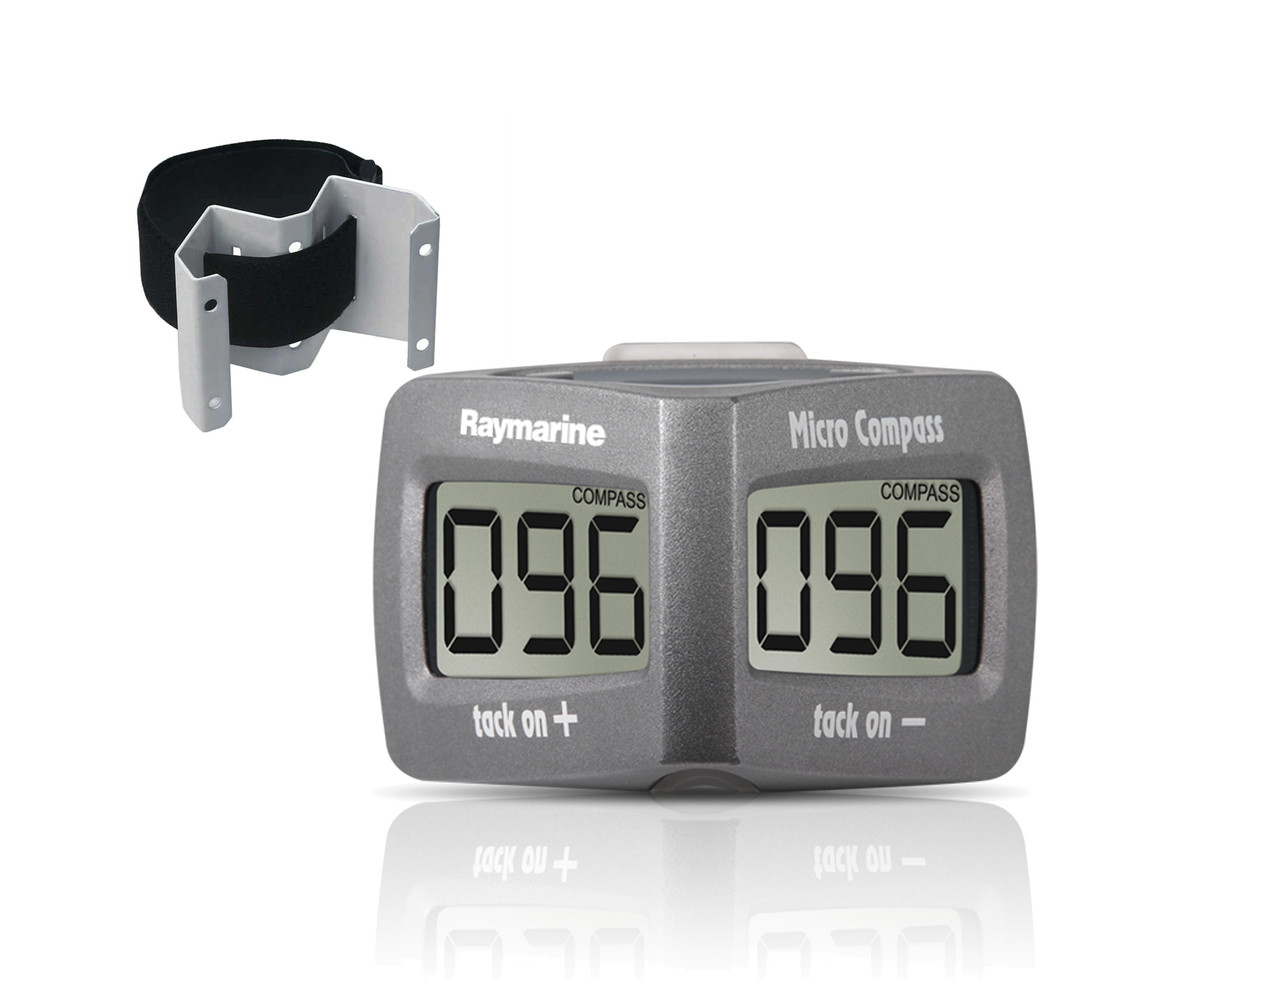 Raymarine Micro Compass System with Strap Bracket